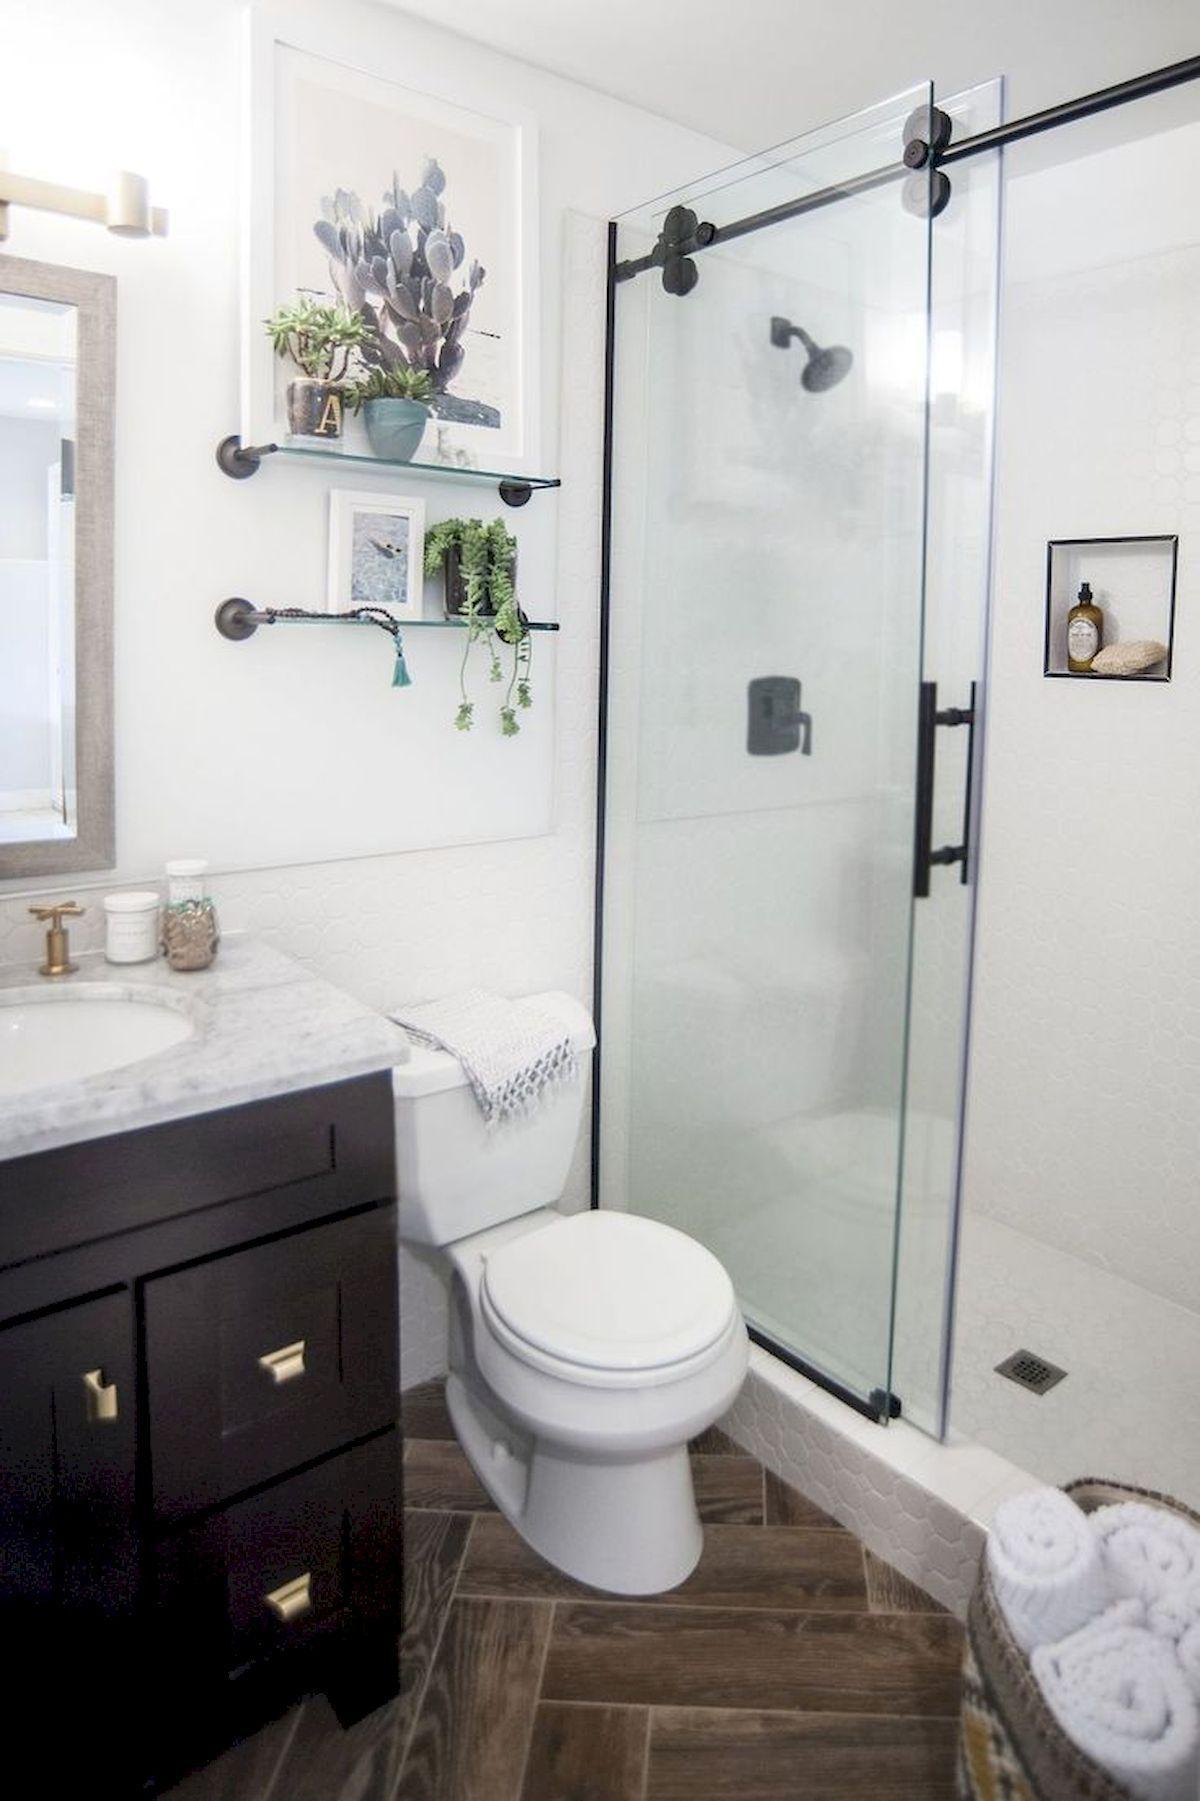 54 Amazing Small Bathroom Remodel Ideas (33 in 2019 ... on Amazing Small Bathrooms  id=54425